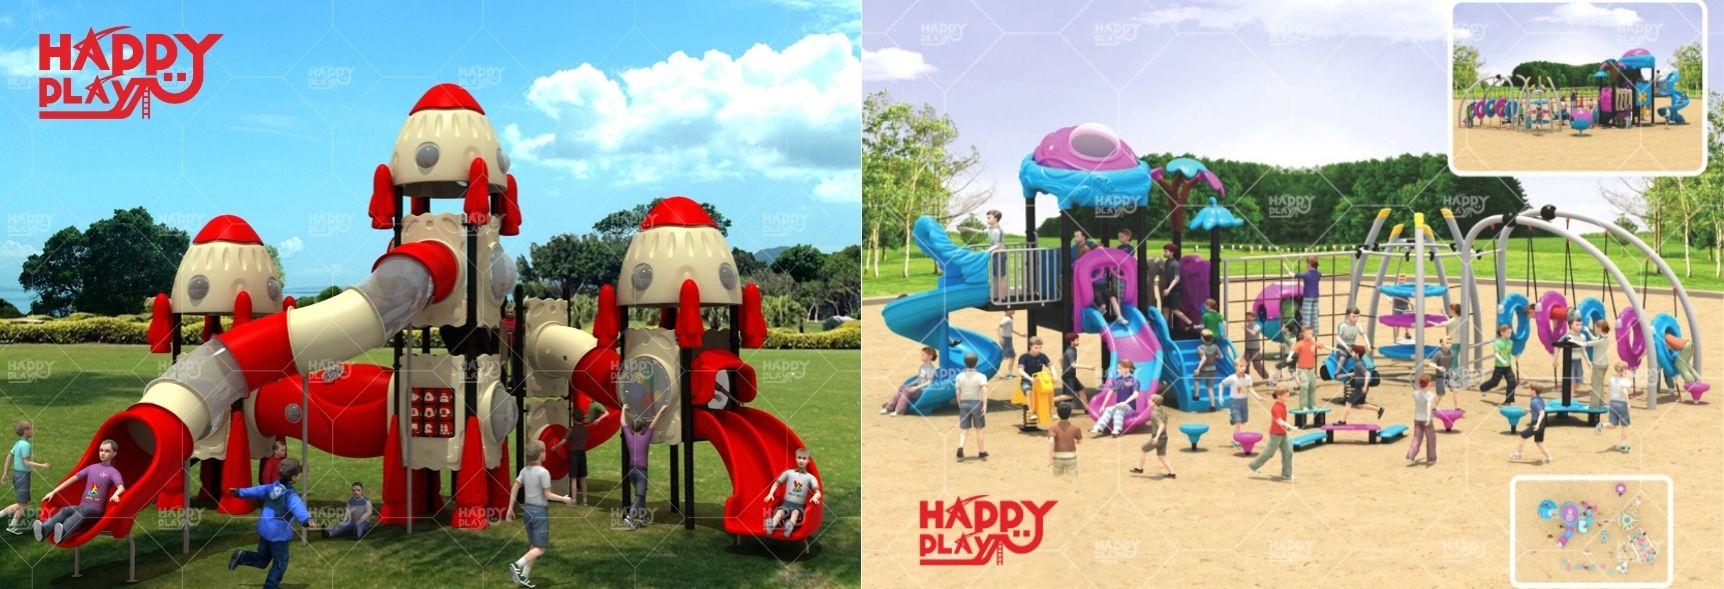 Bermain Agresif Menggunakan Playground & Buat Passiveincome